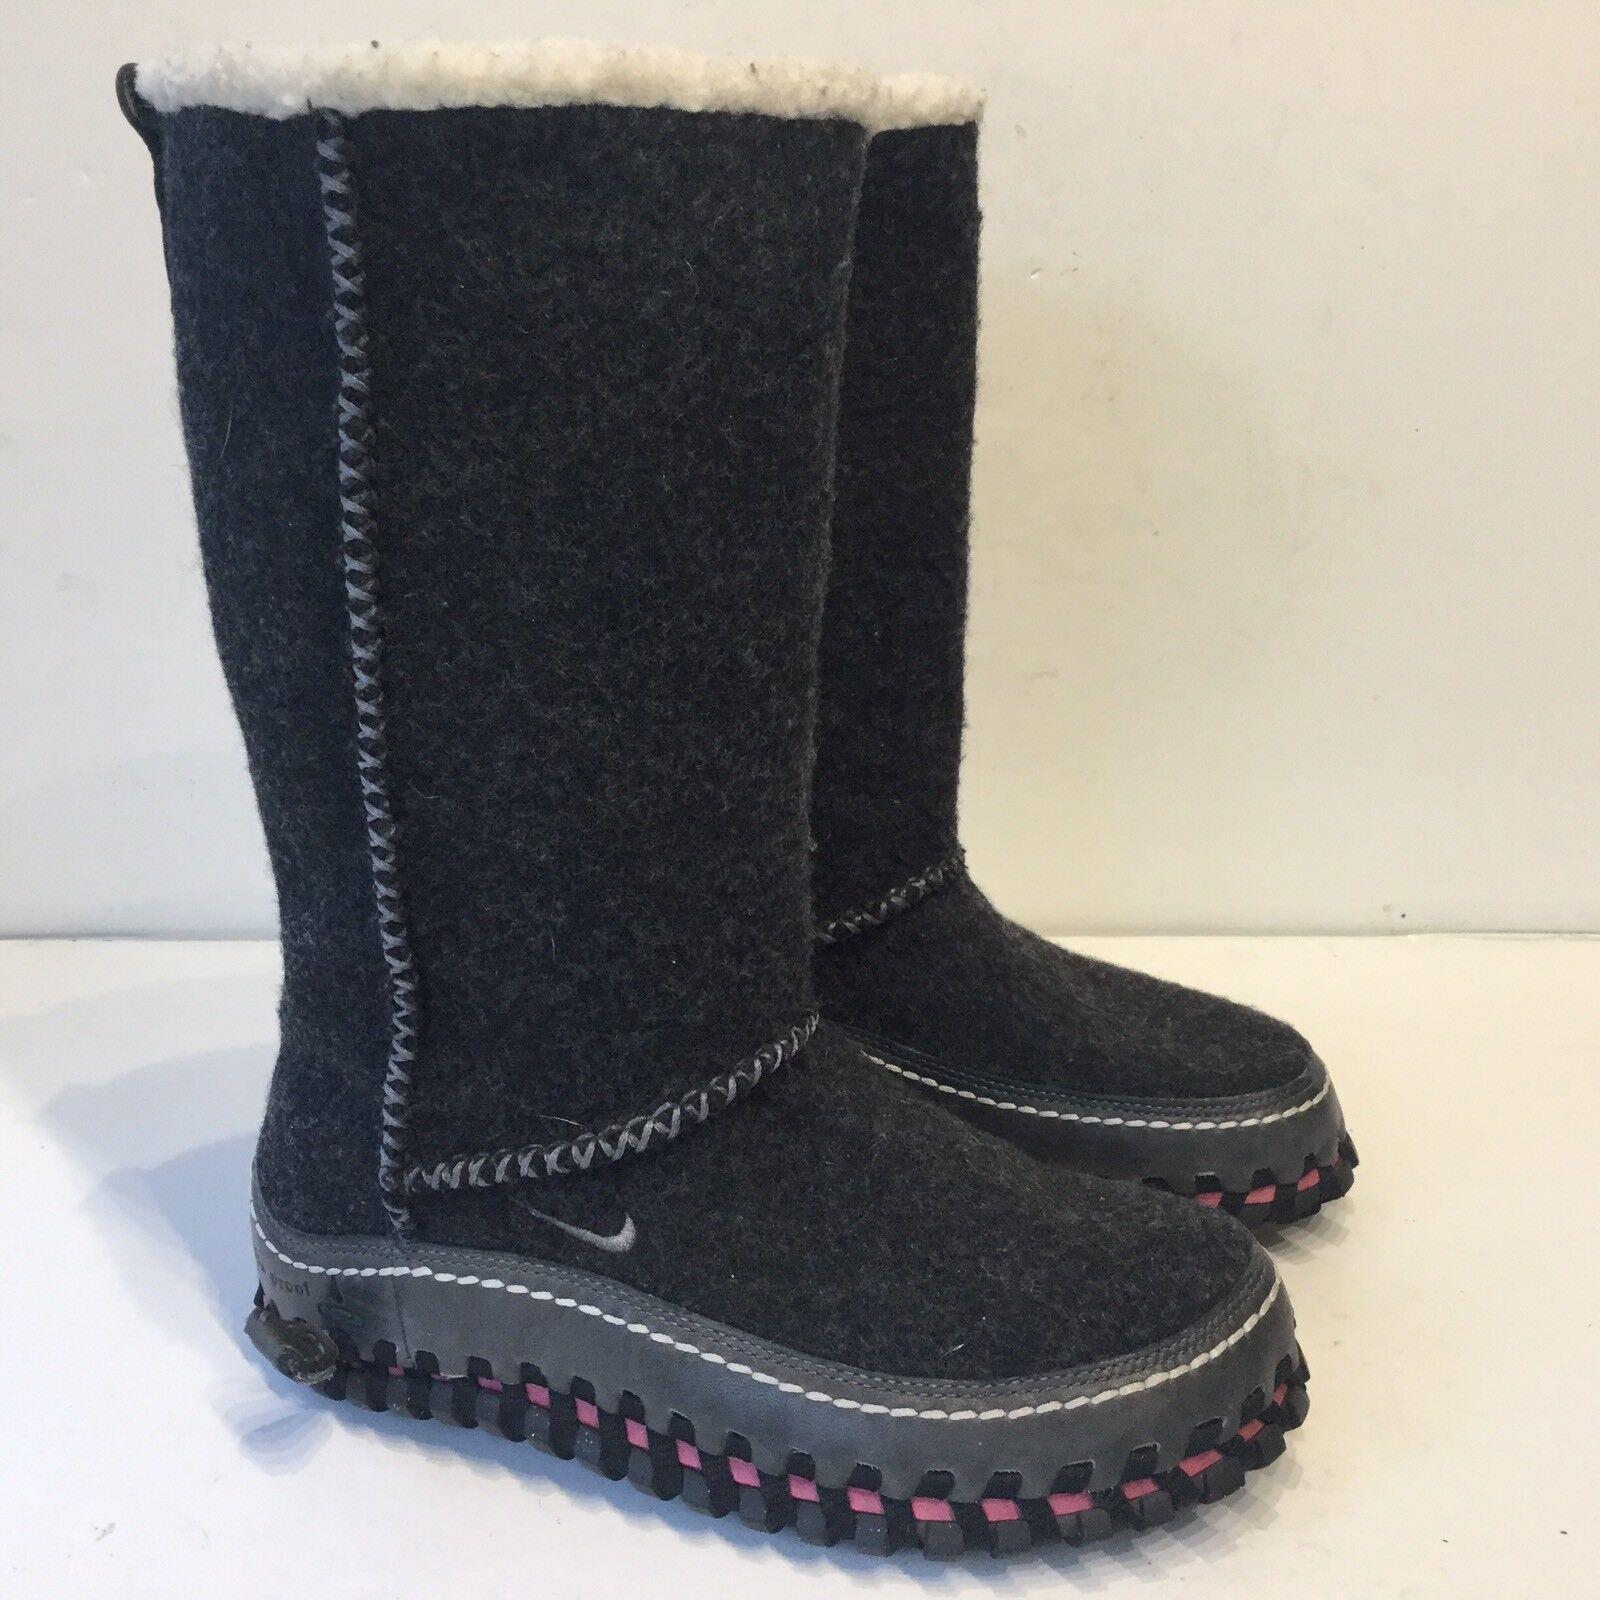 Nike ACG Valenka Wool Boots Womens shoes fleece lined warm hard 2 find RARE Sz 5